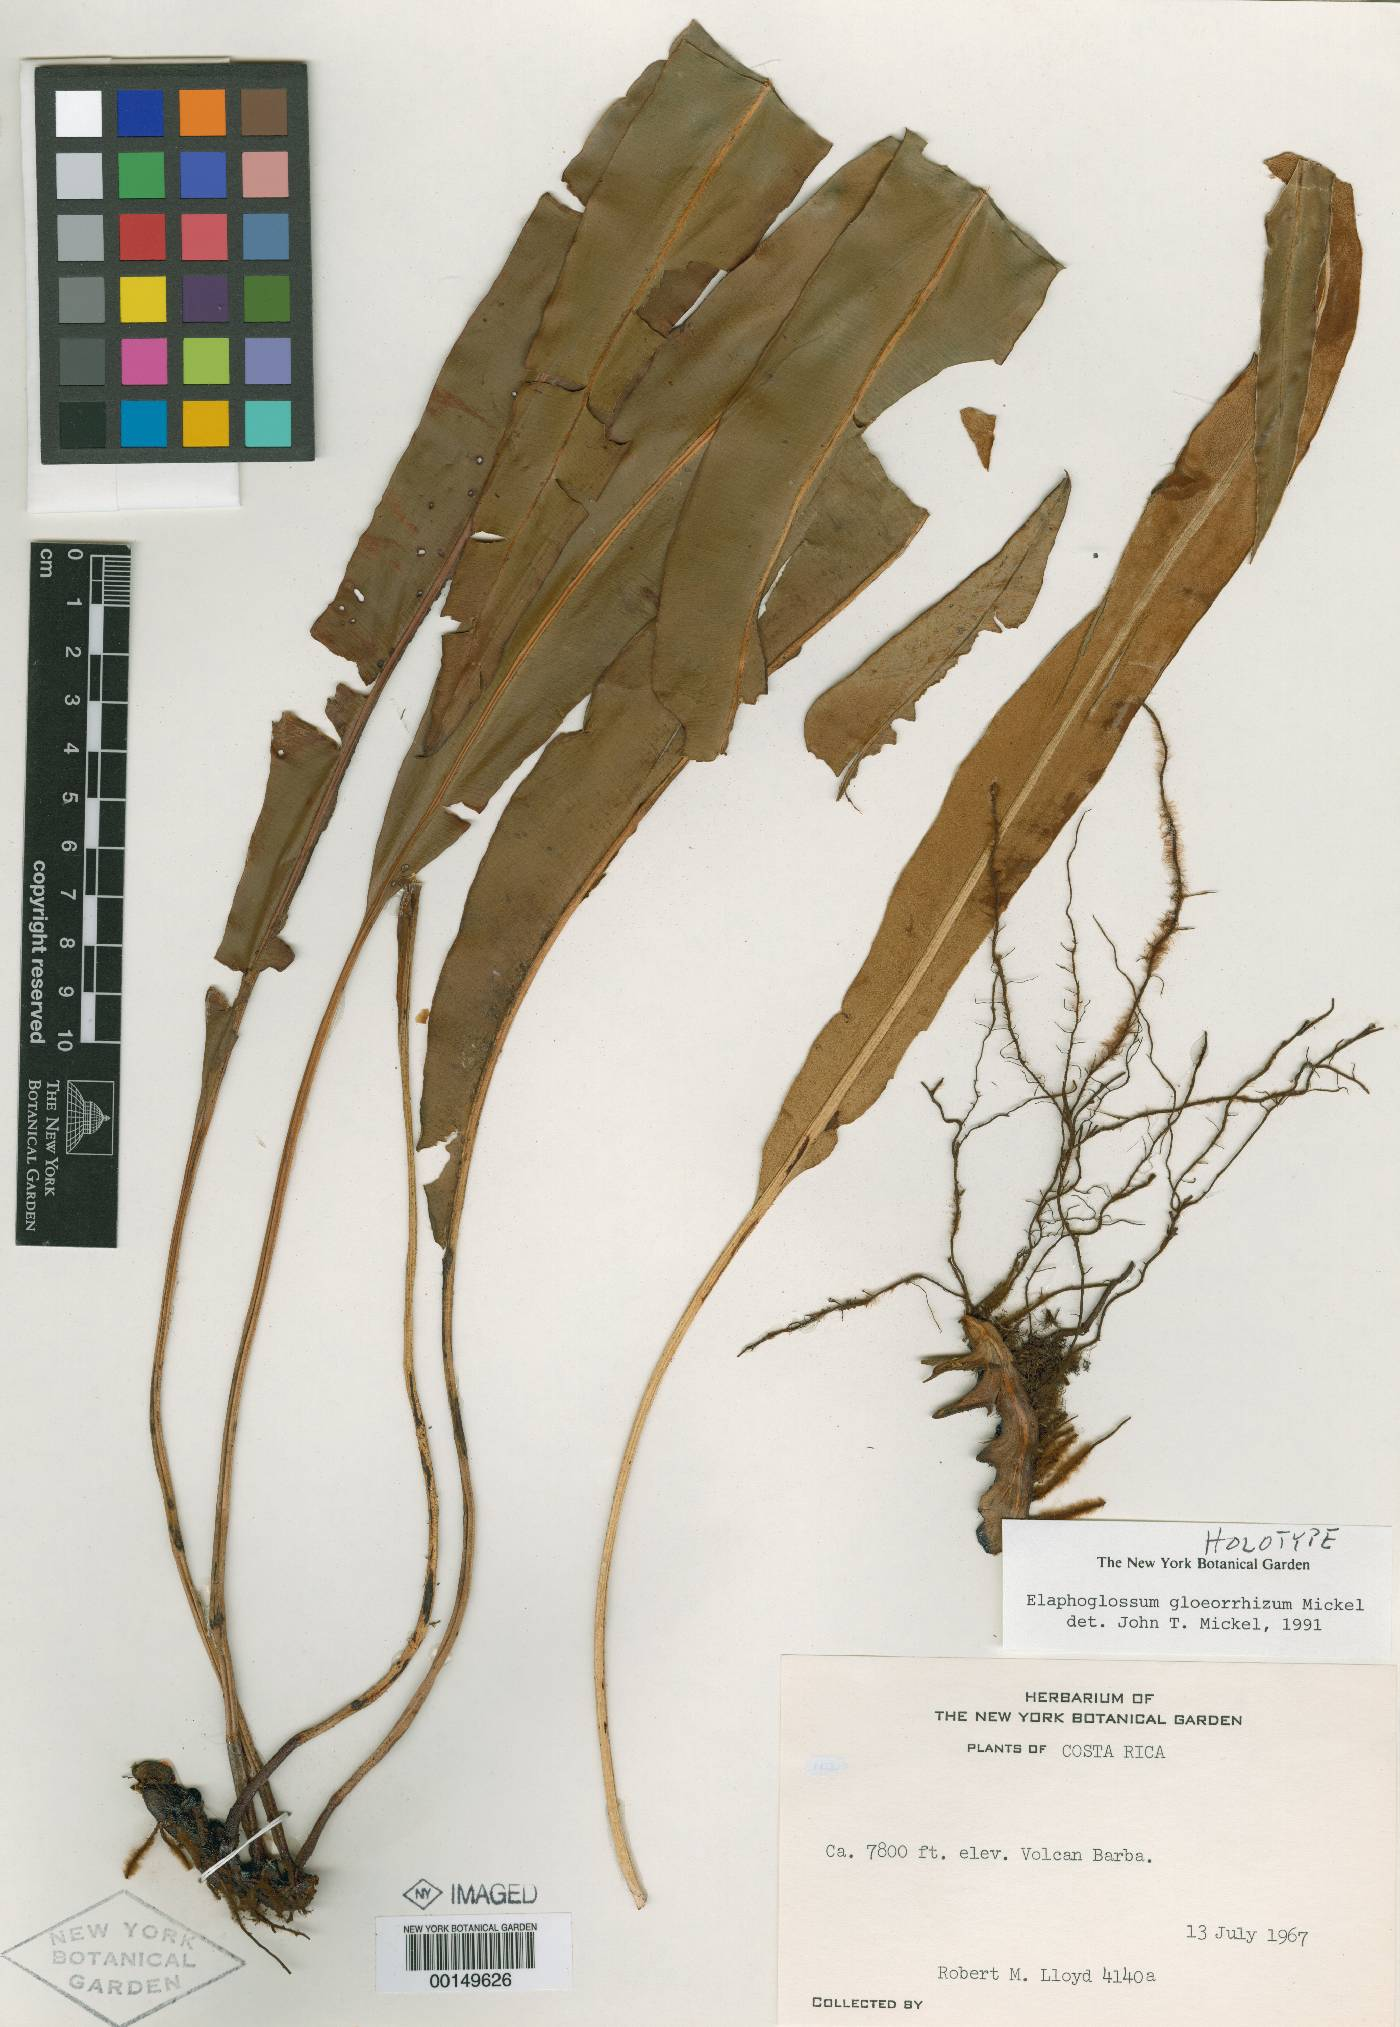 Elaphoglossum gloeorrhizum image